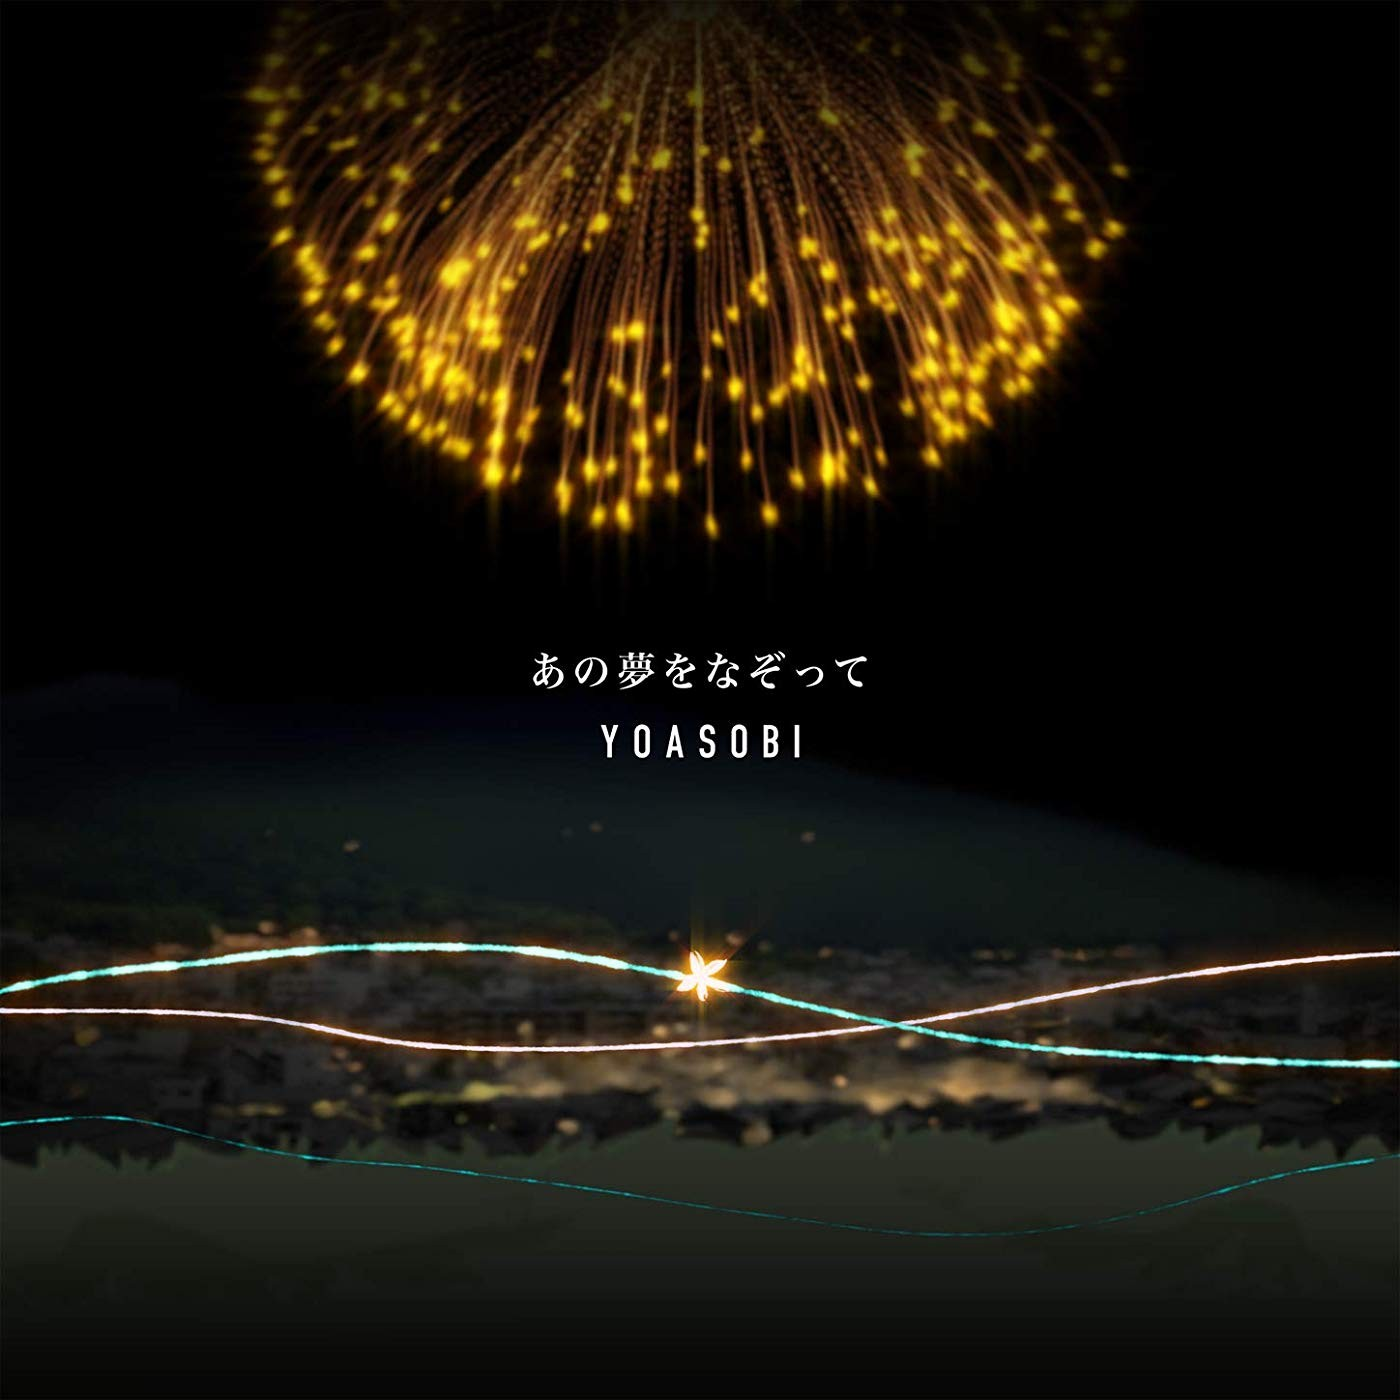 YOASOBI – あの夢をなぞって [24bit Lossless + MP3 320 / WEB] [2020.01.18]